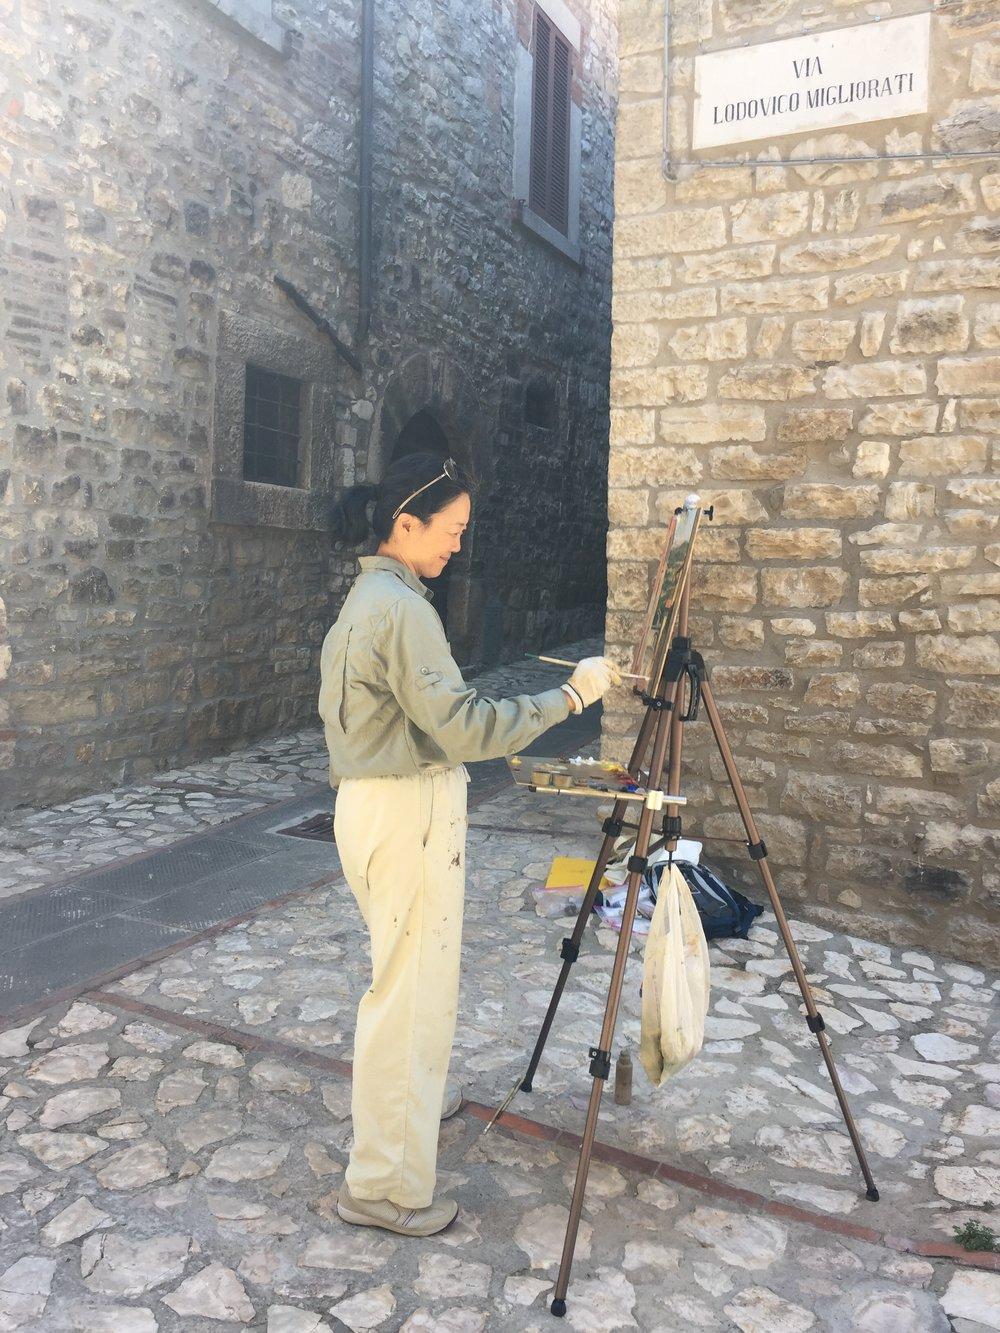 Painting in Monte Castello di Vibio, June 2017